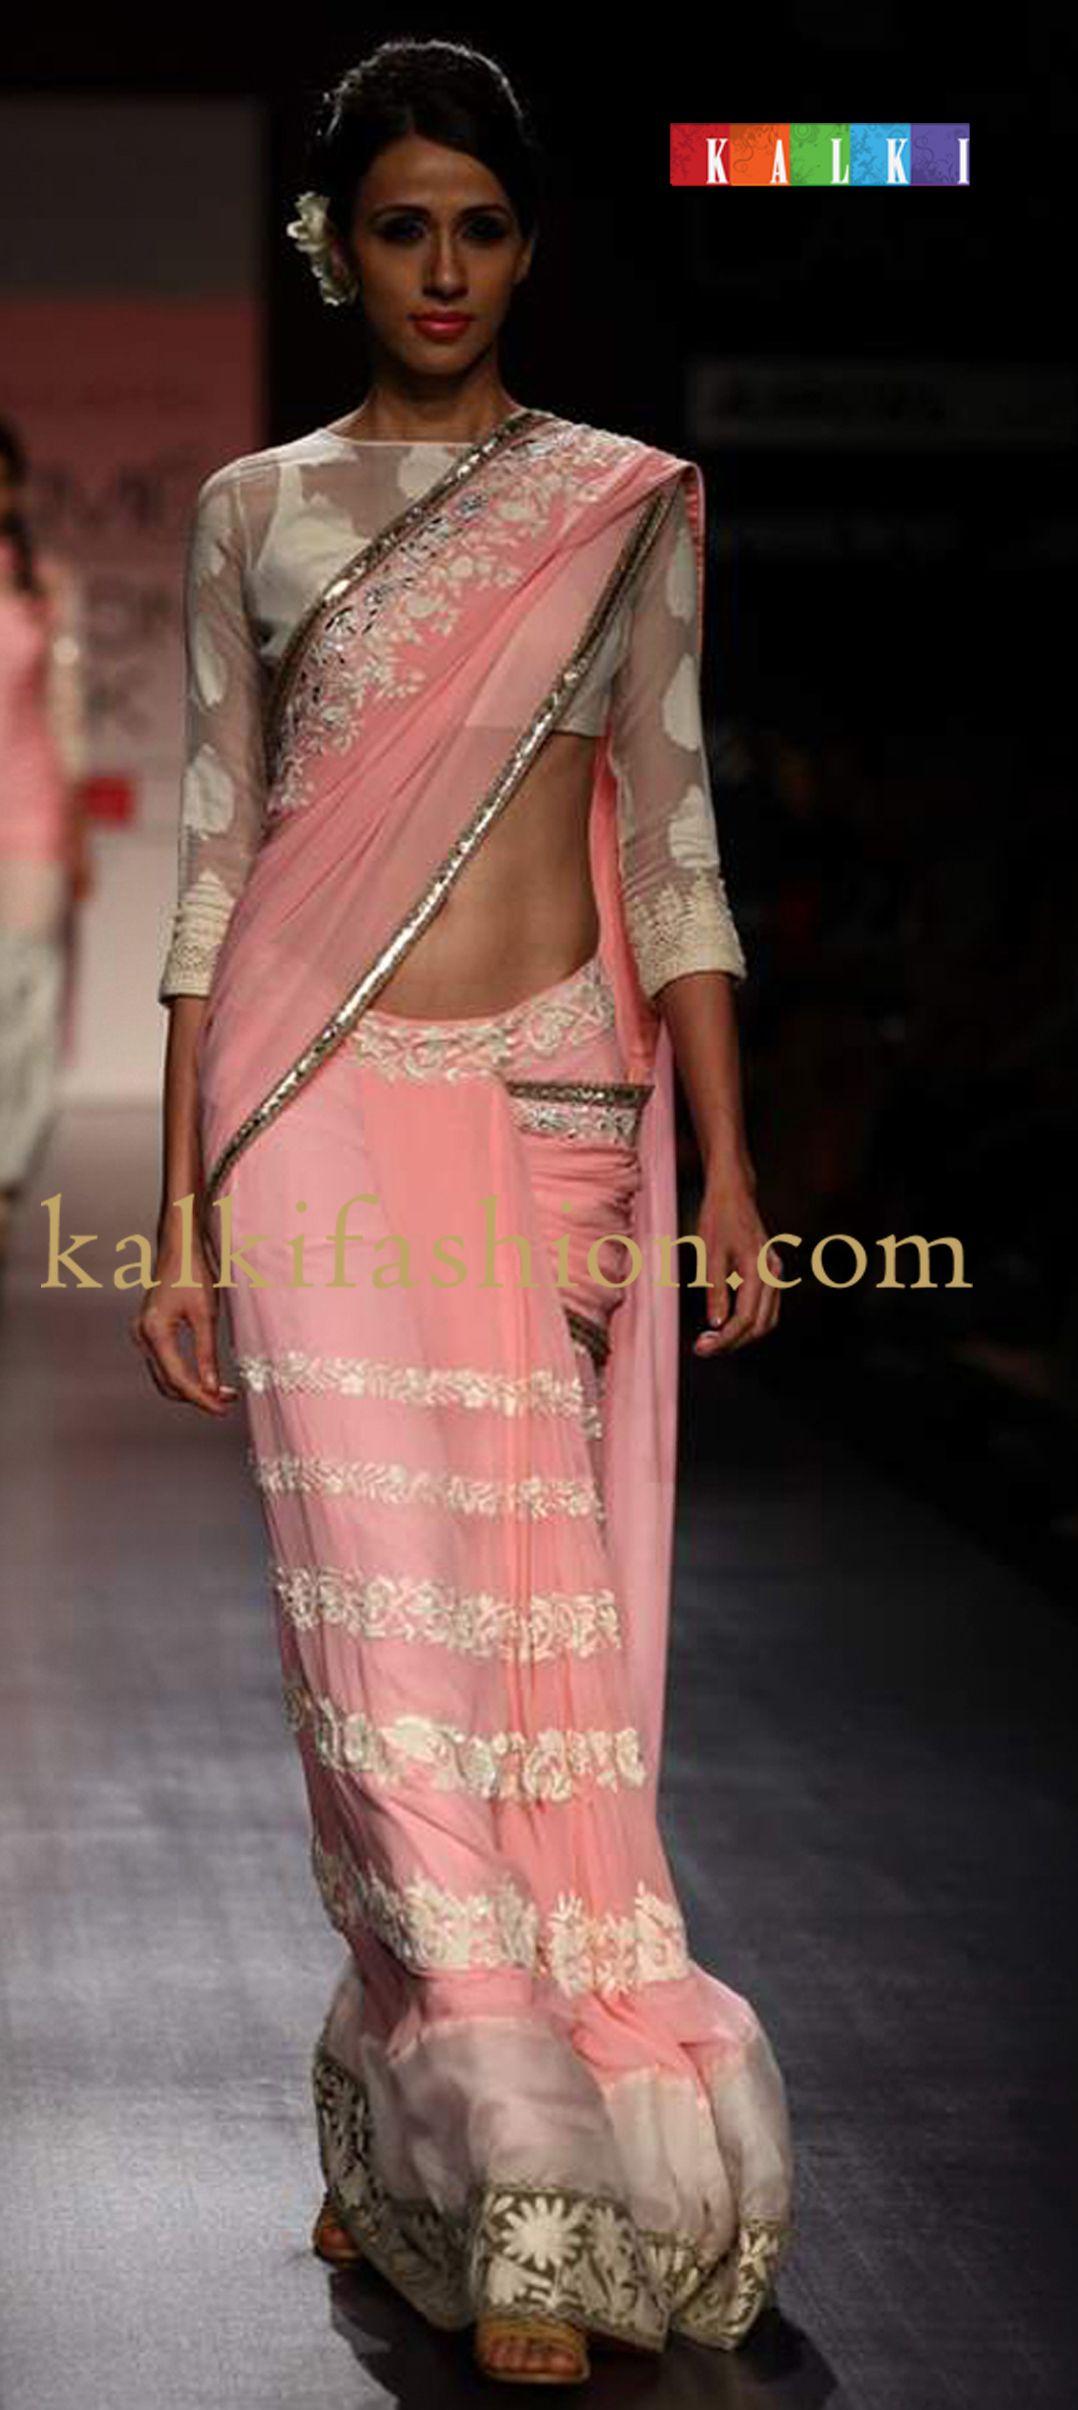 http://www.kalkifashion.com/designers/manish-malhotra.html lakme ...